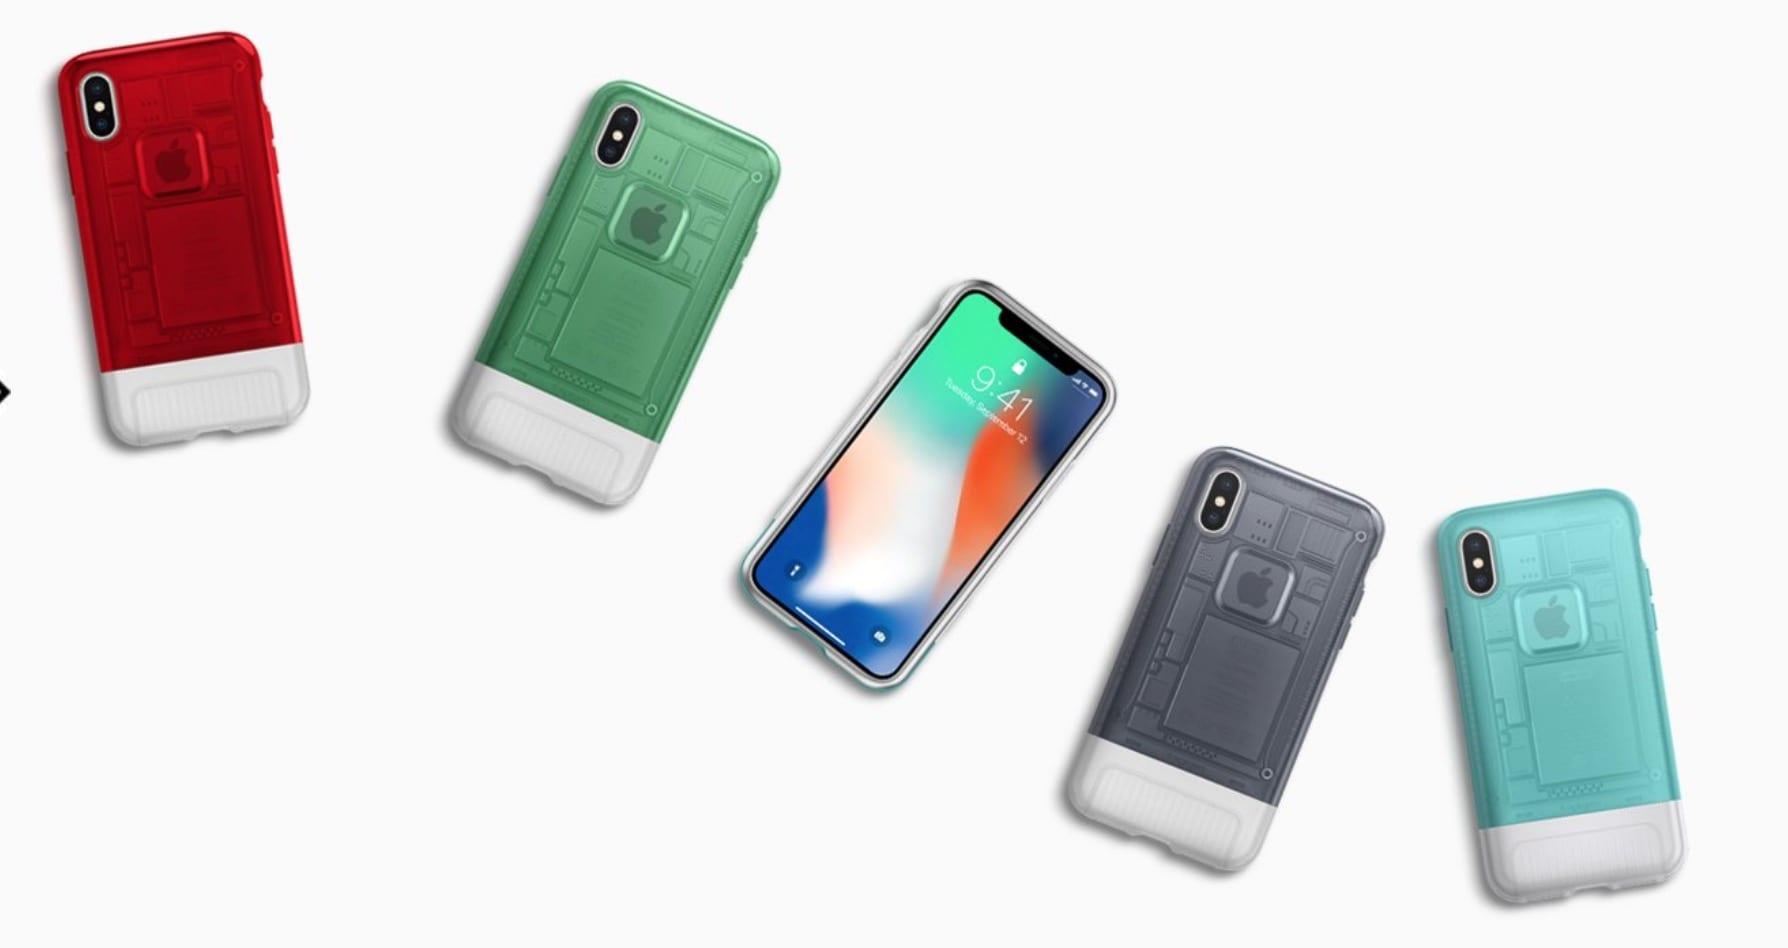 spigen retro cases iphone x colors - Spigen predstavil sériu retro obalov pre iPhone X